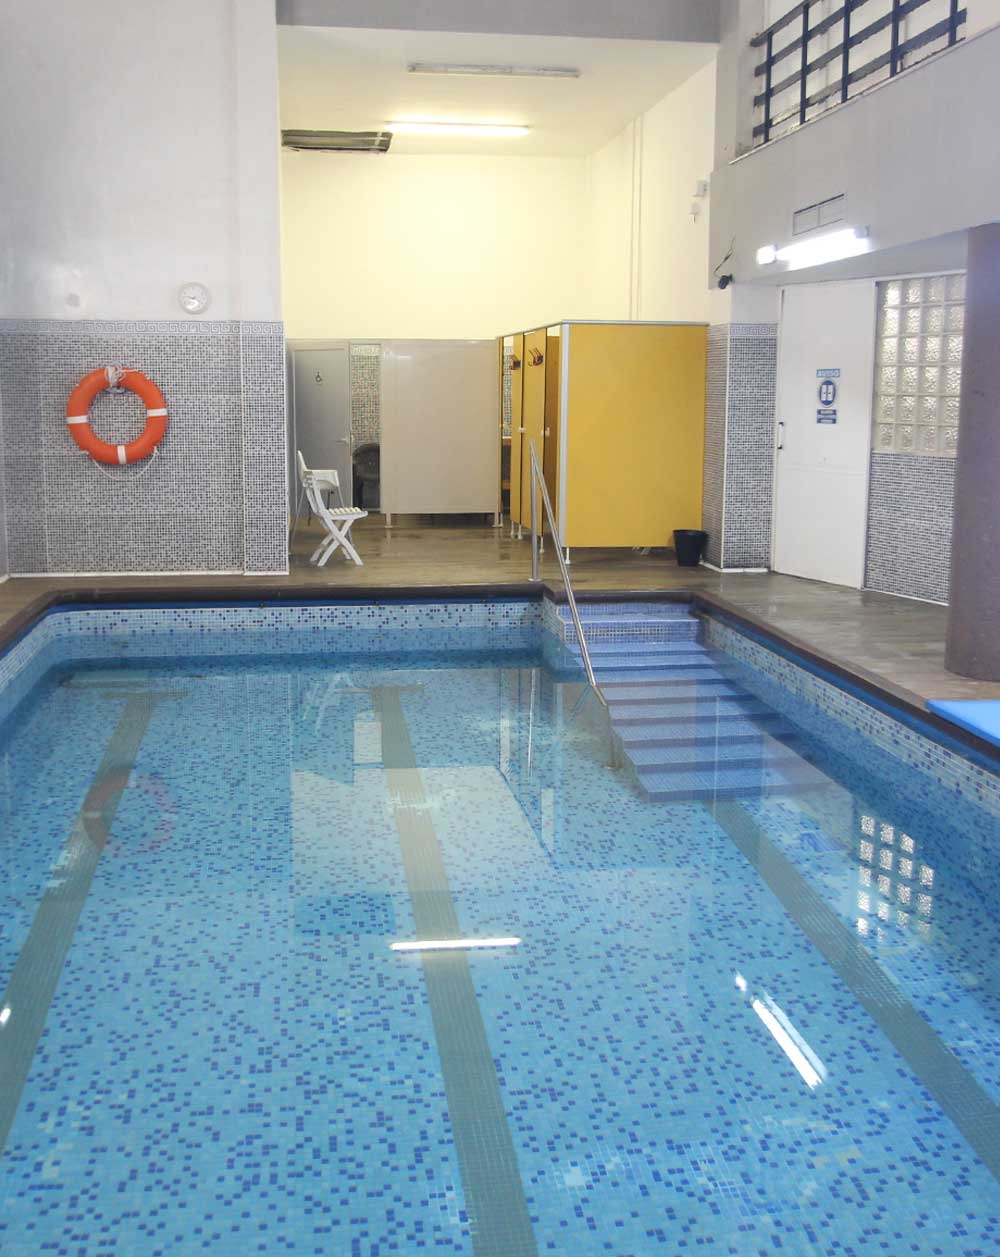 colegio-mayor-universsitario-zaragoza-piscina-11